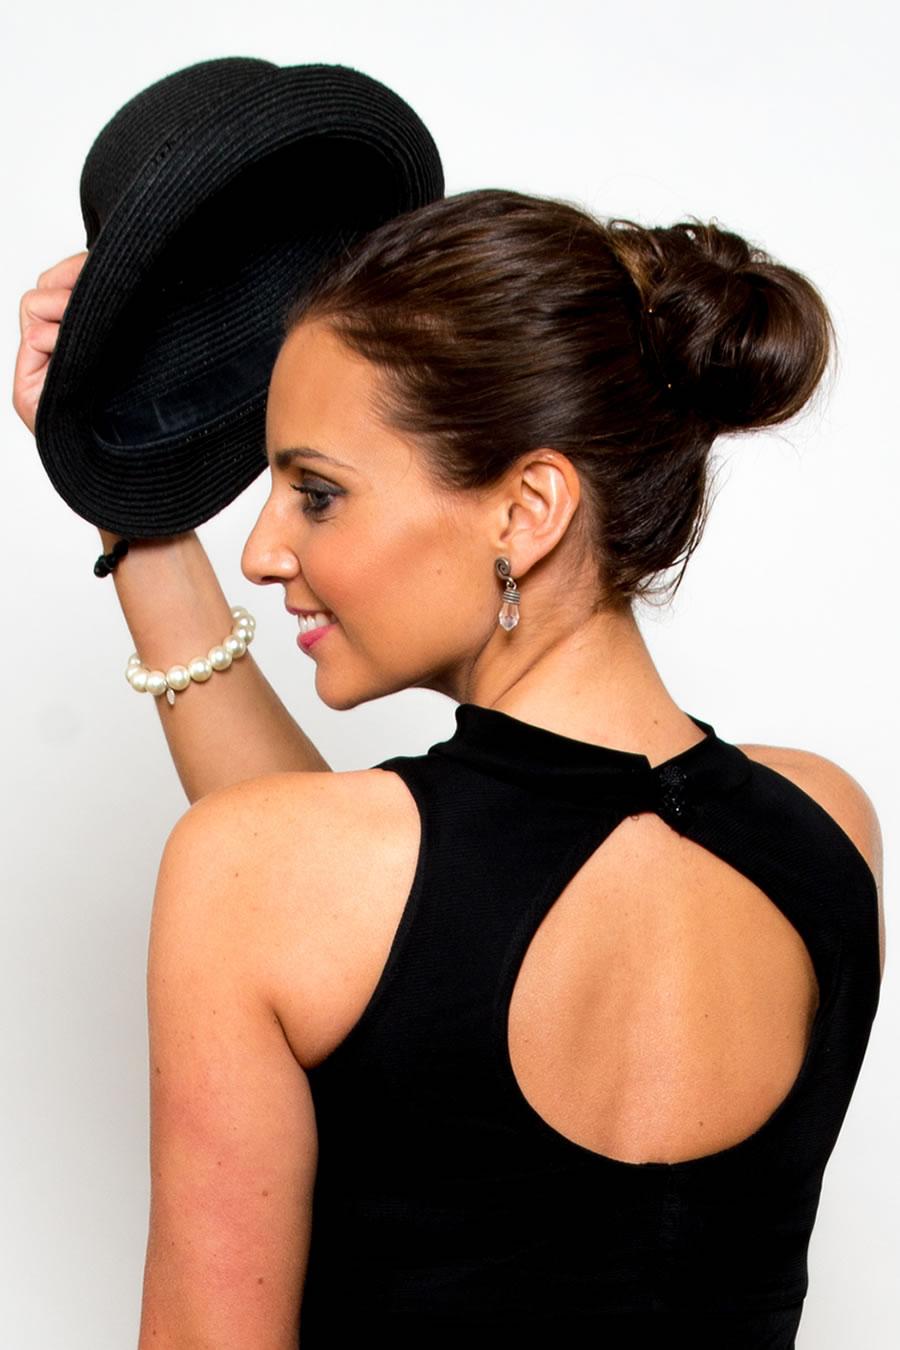 Tango Clothing Dresses Amp Fashion Made In The Uk Femme